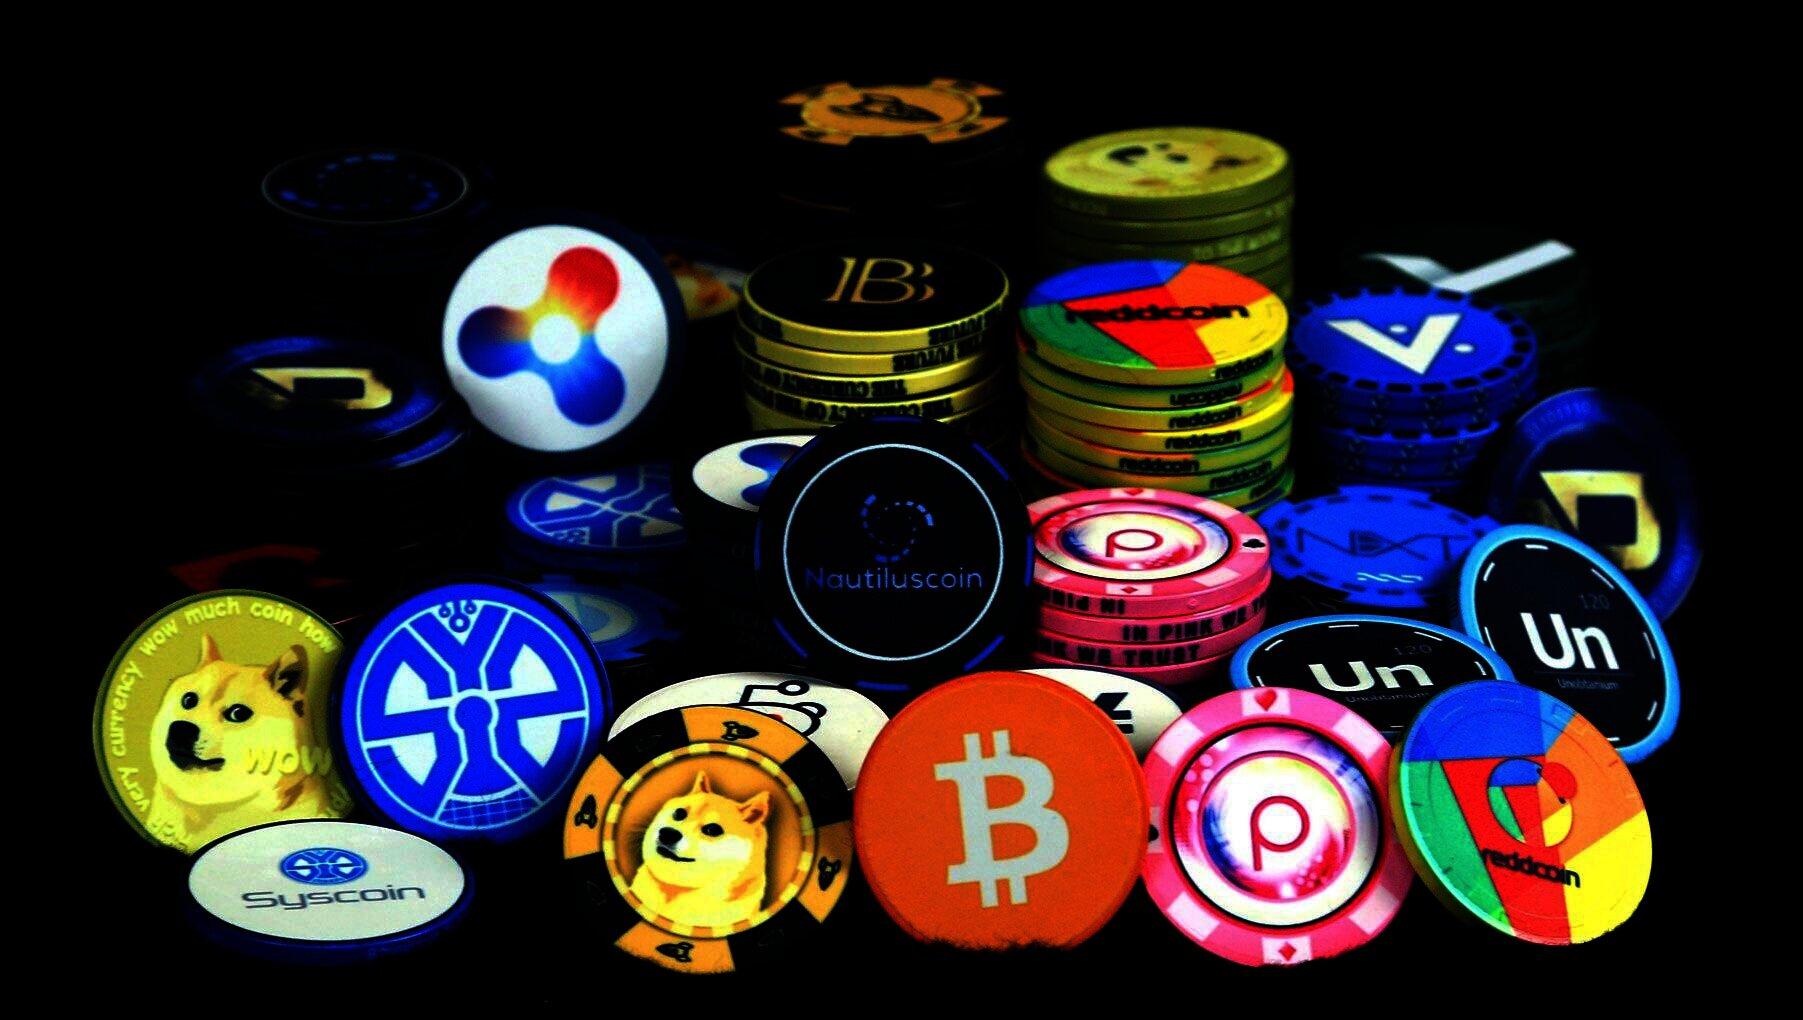 (c) Crypto-gids.nl